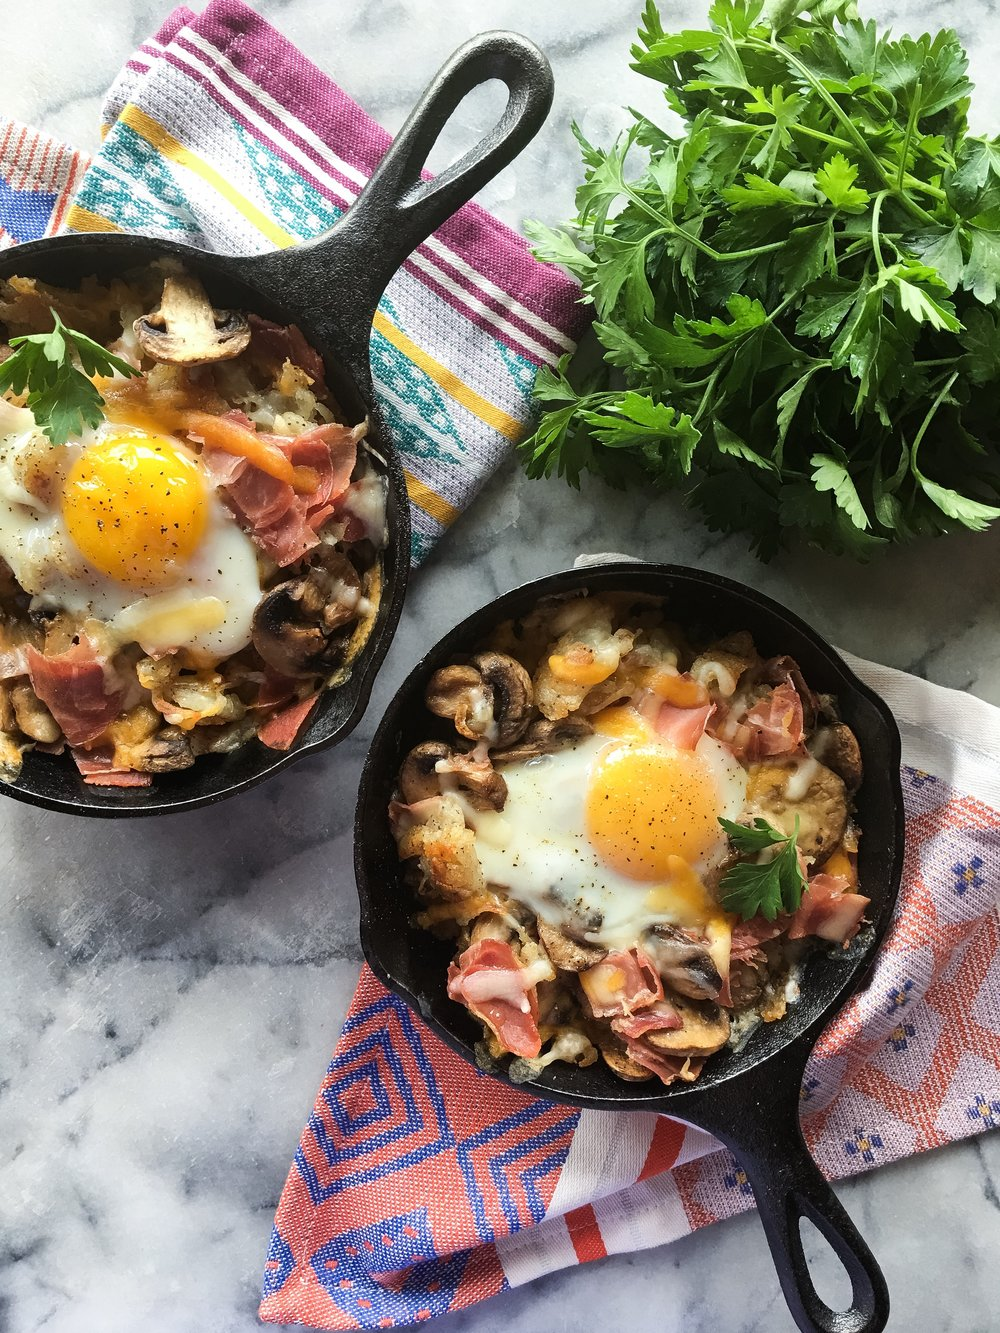 baked_eggs_pancetta_mushrooms_02